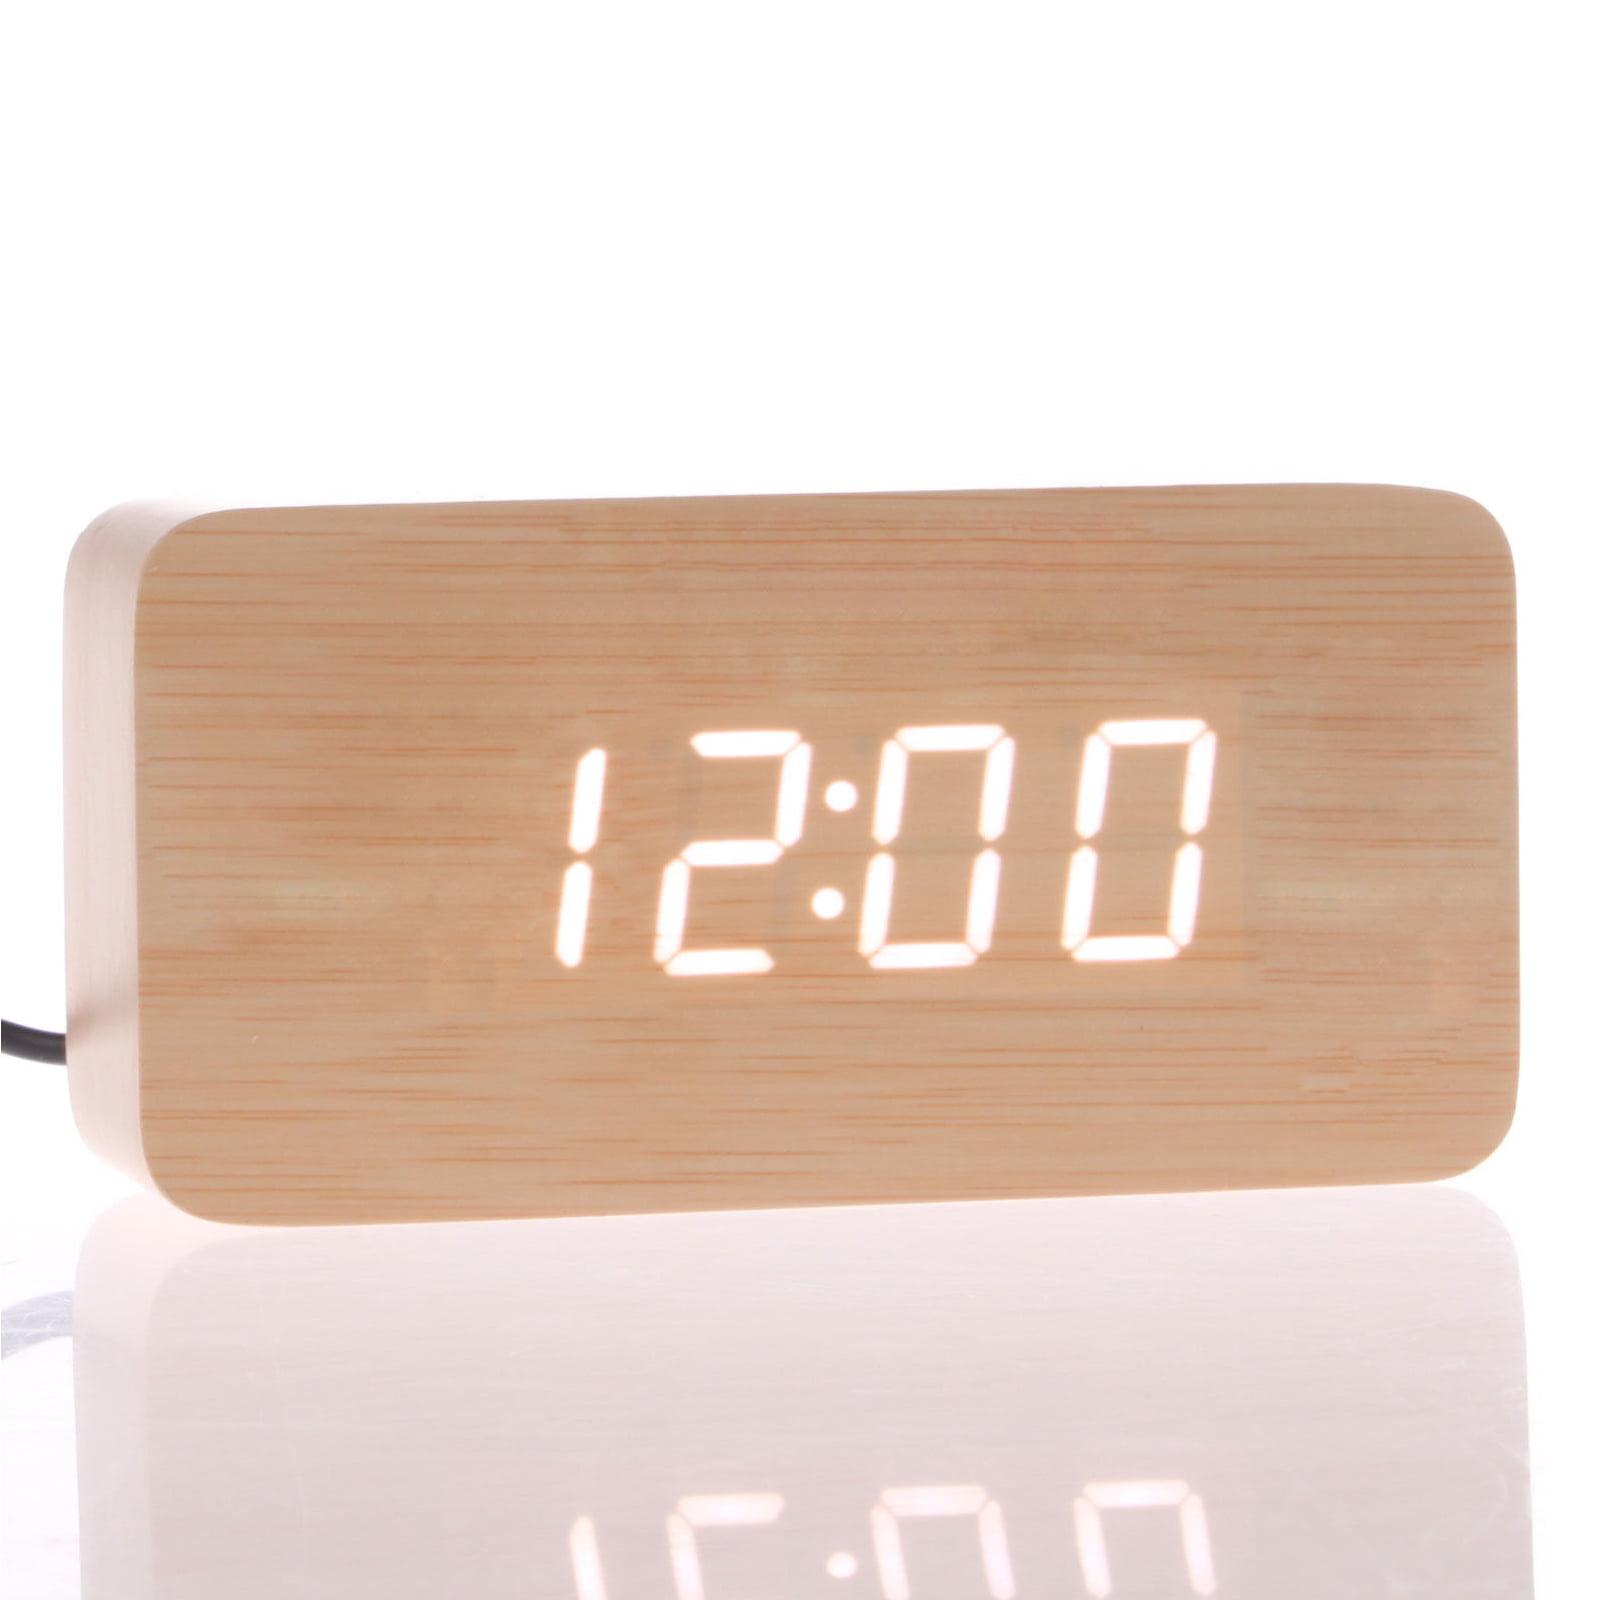 Morden Wooden Wood Digital LED Desk Alarm Clock Thermometer Timer Calendar(Bamboo) by